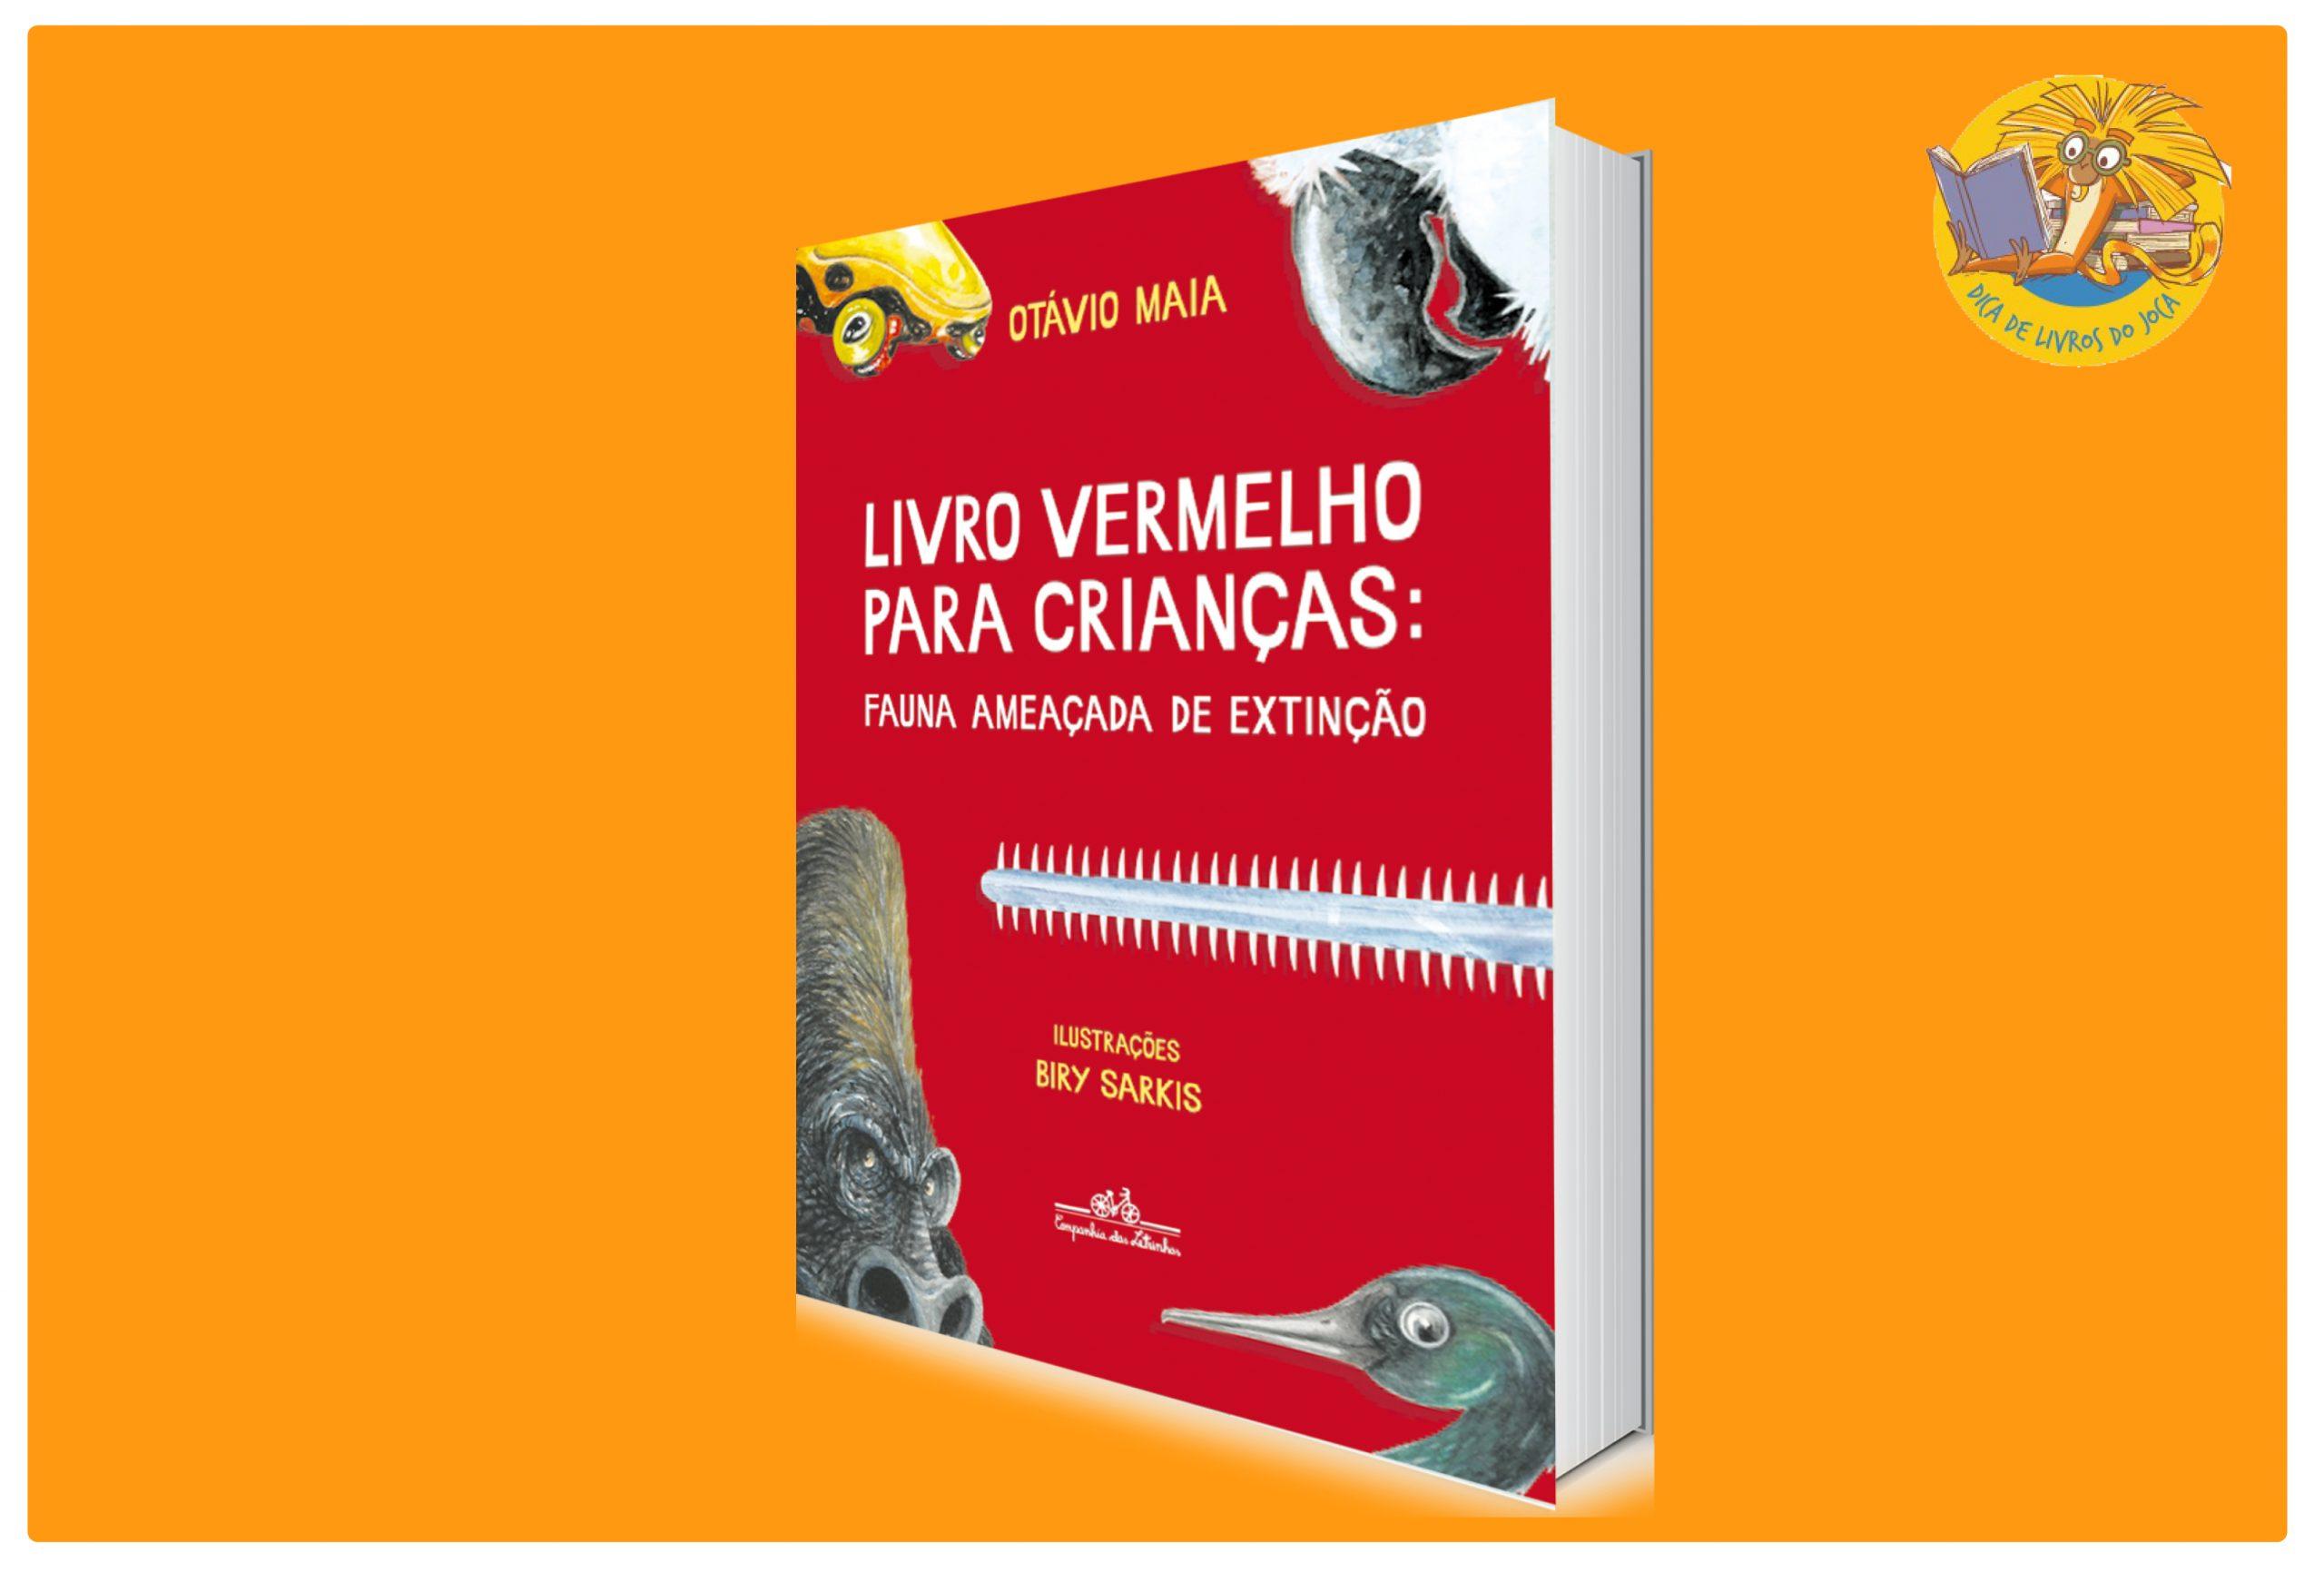 interna_livro vermelho